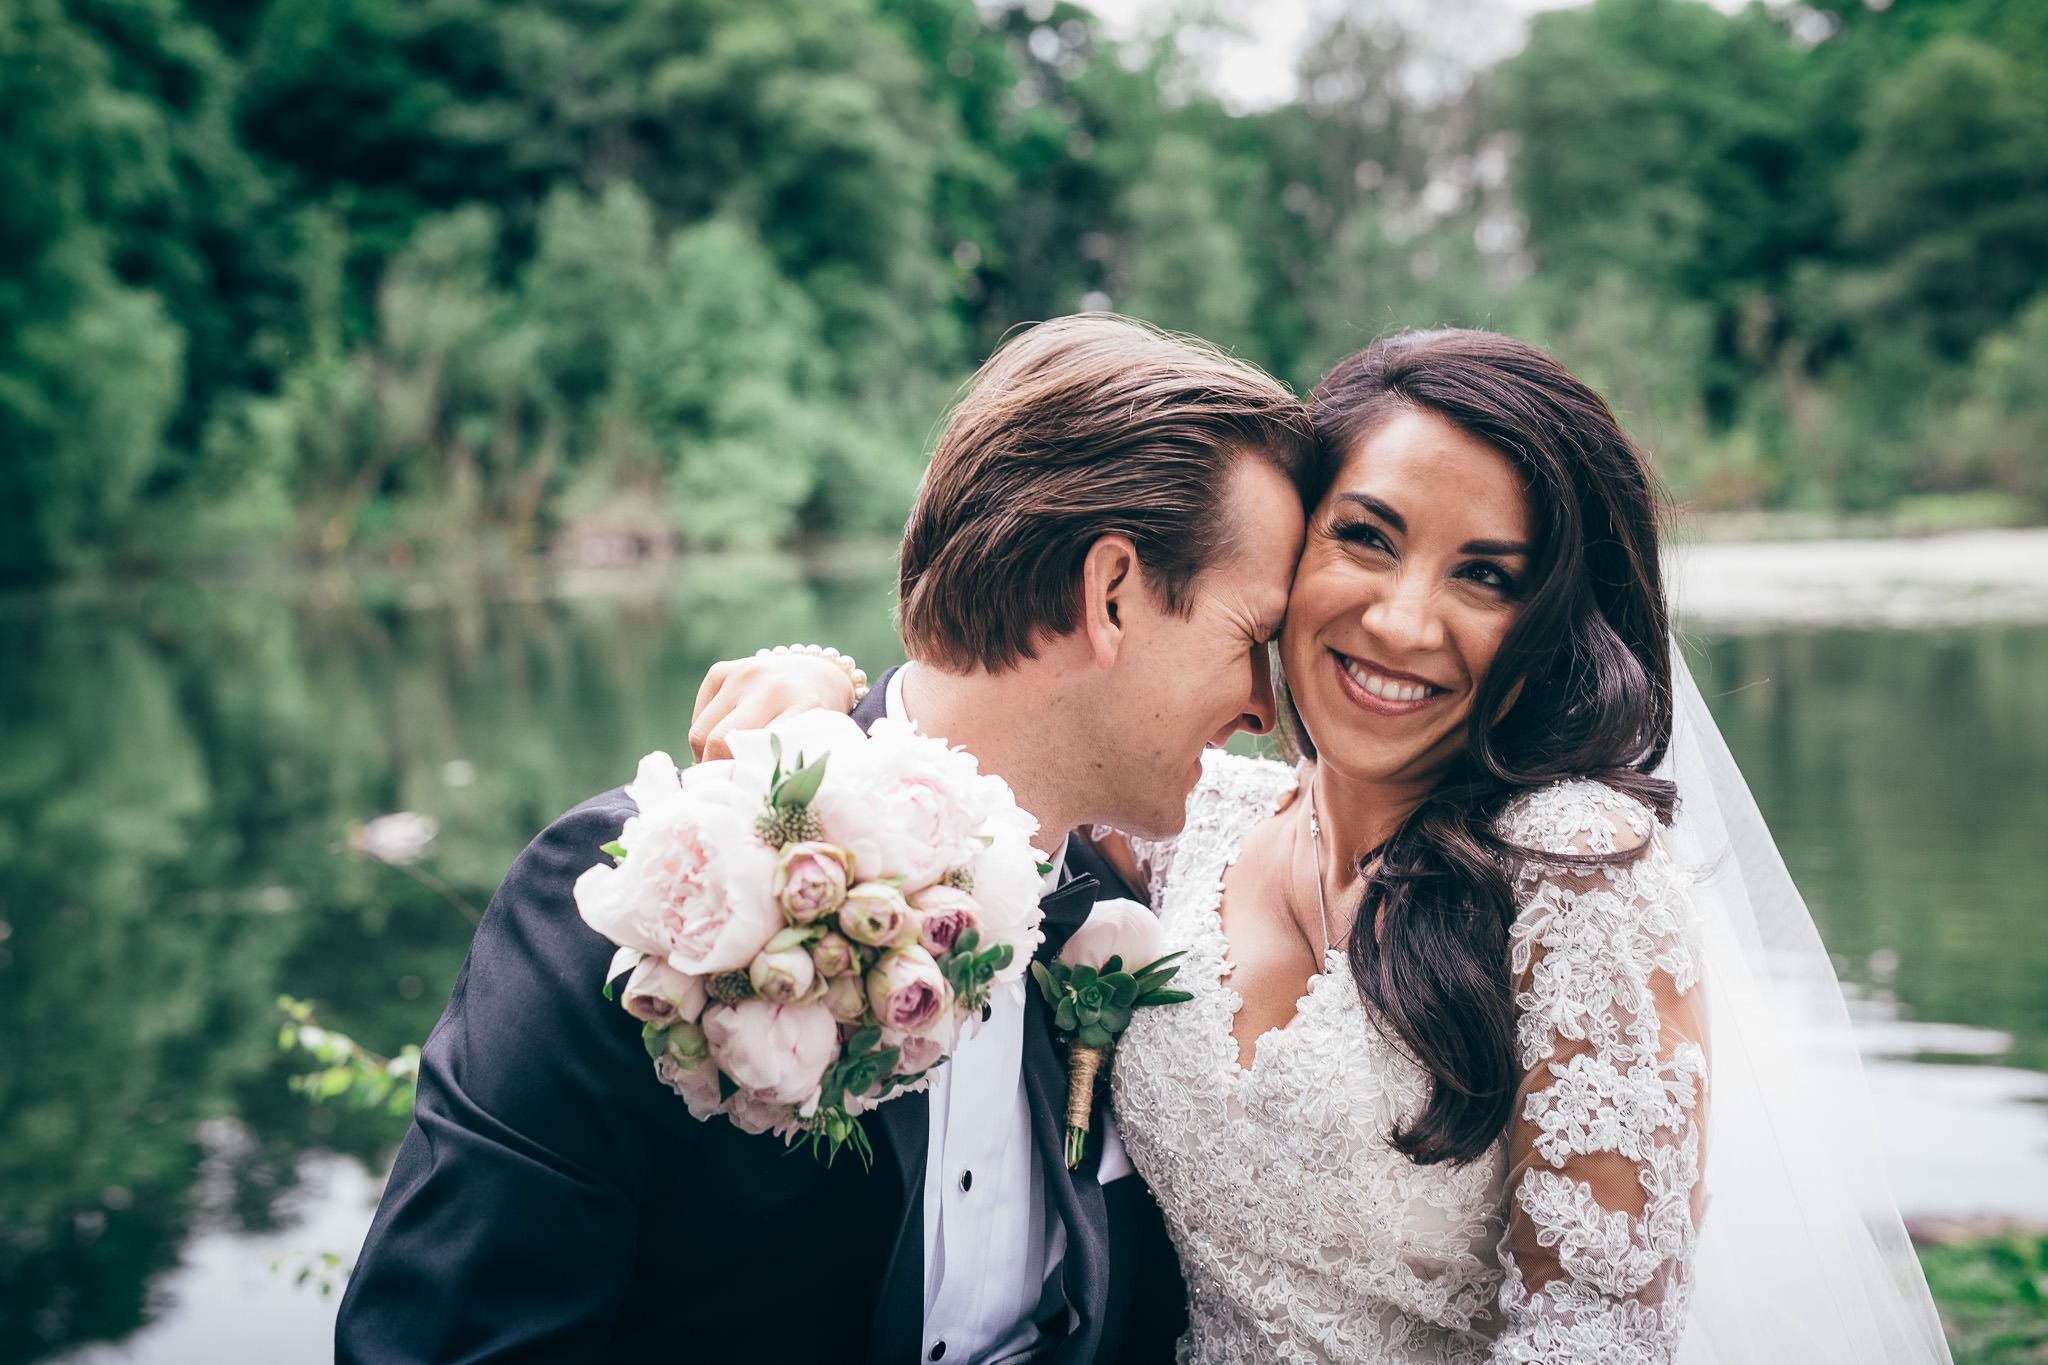 Wedding+Photographer+Norway+Bryllupsfotograf+Casey+Arneson+MK-168.jpg